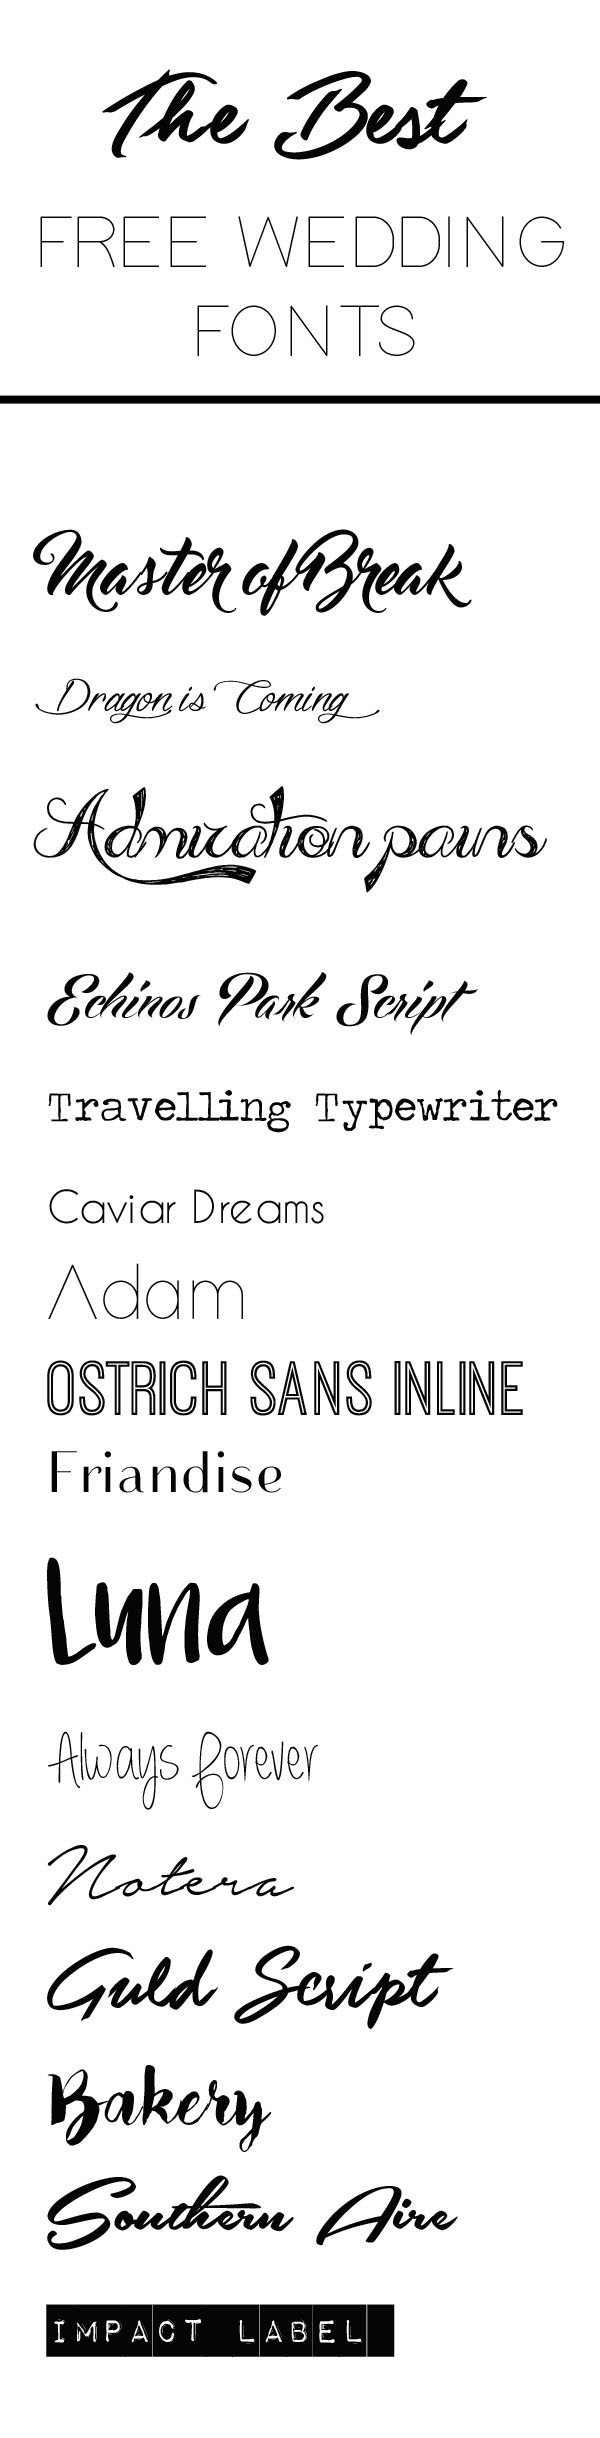 free wedding fonts # 39